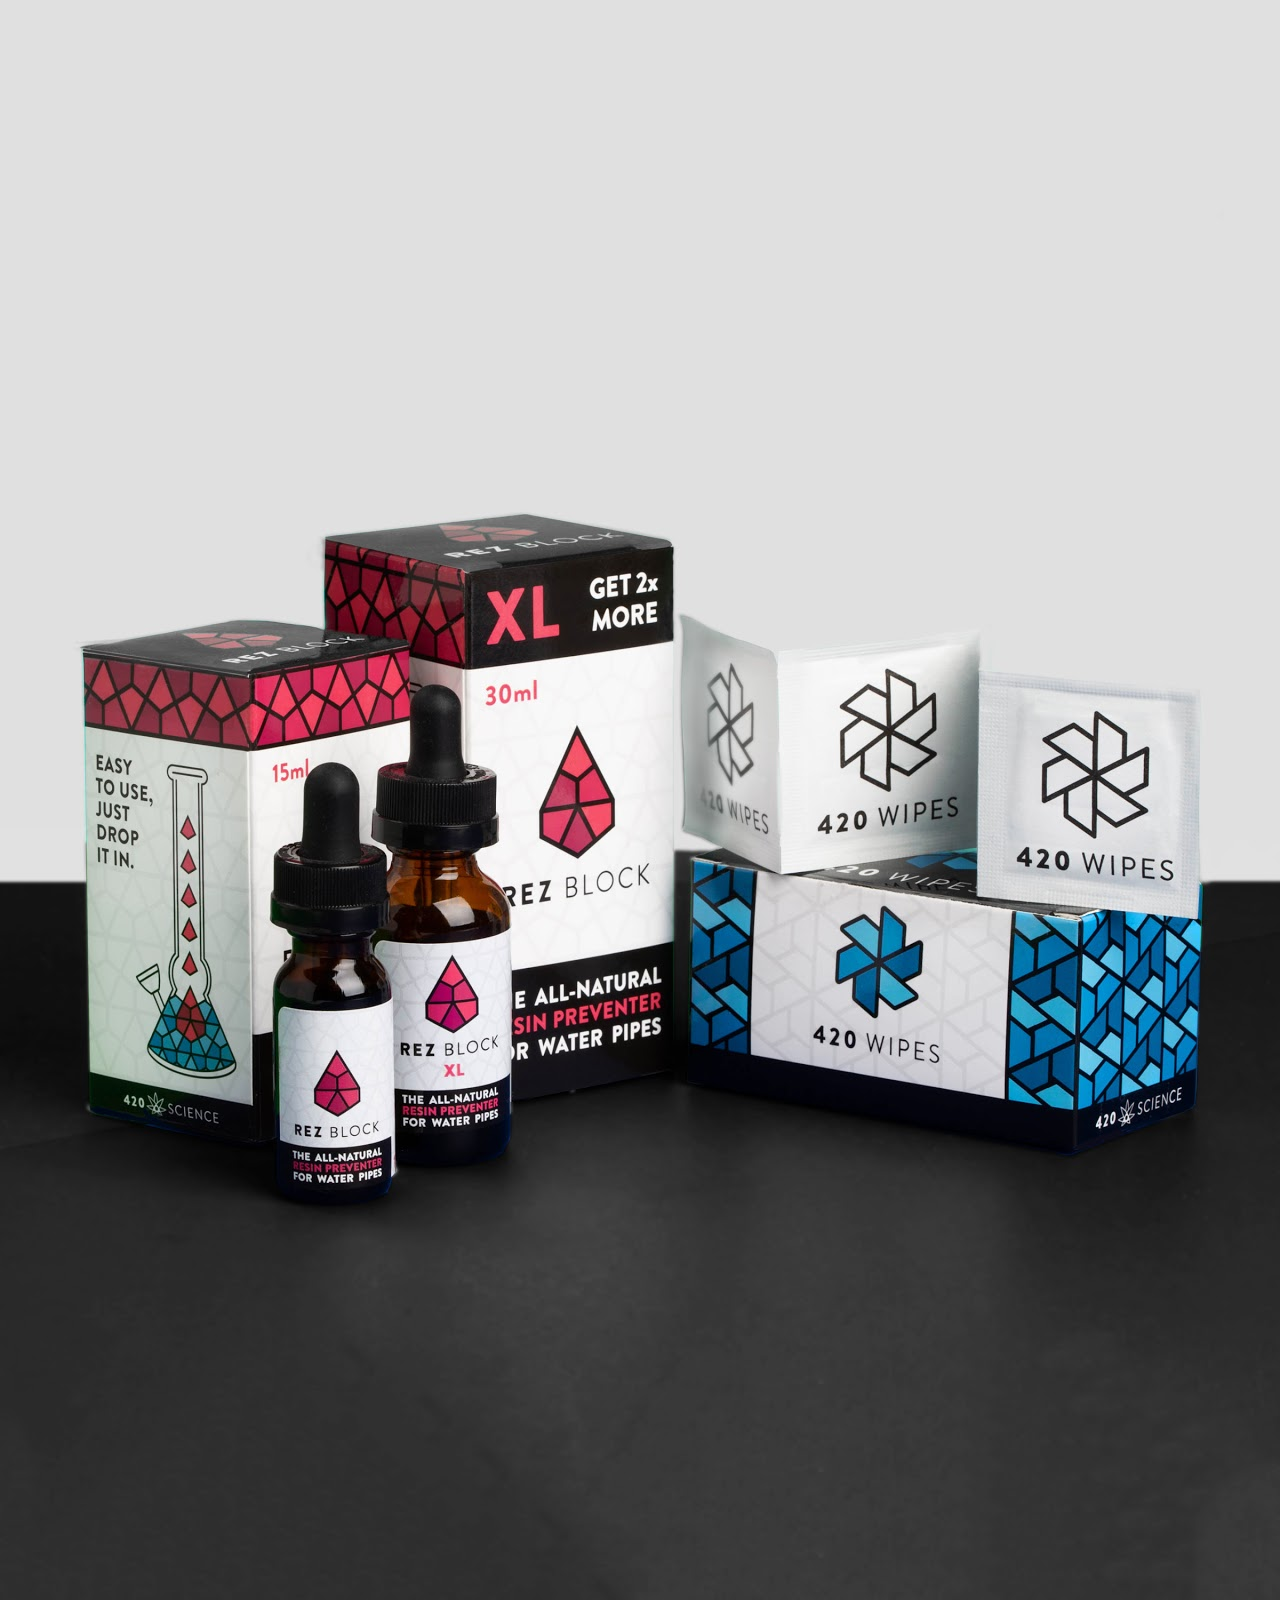 420 Science brand identity by High Road Design Studio